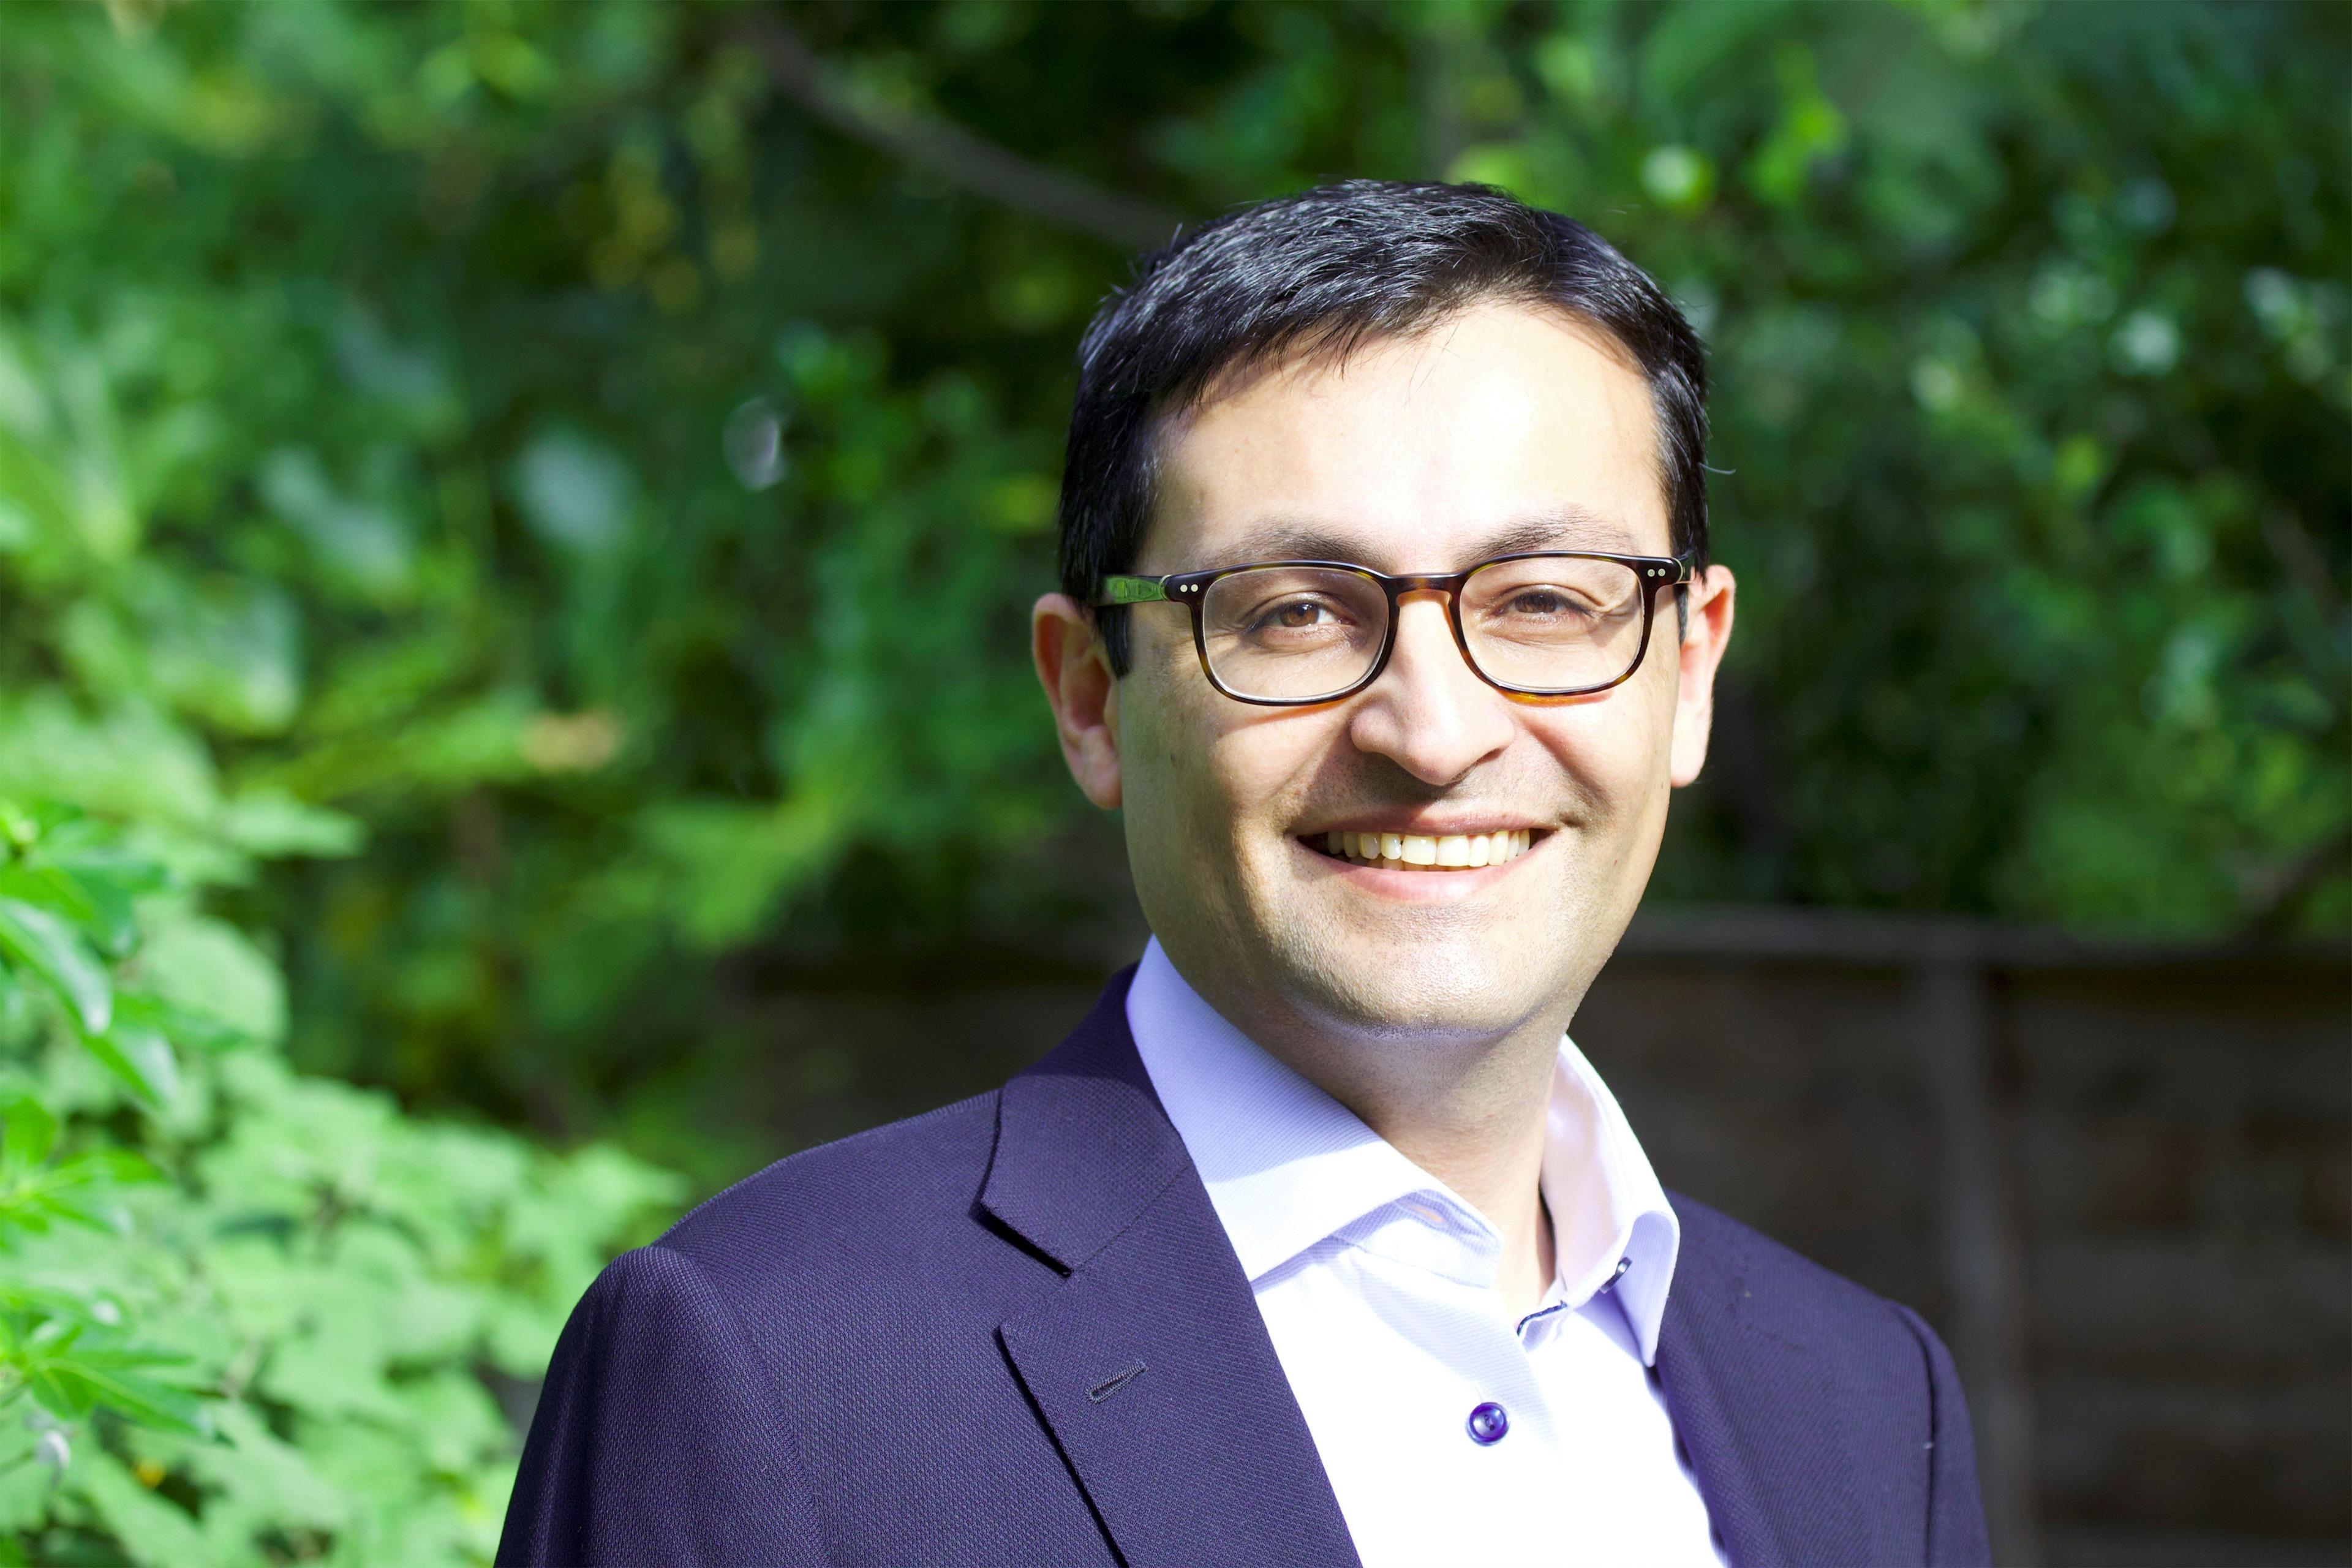 Jamil Mawji